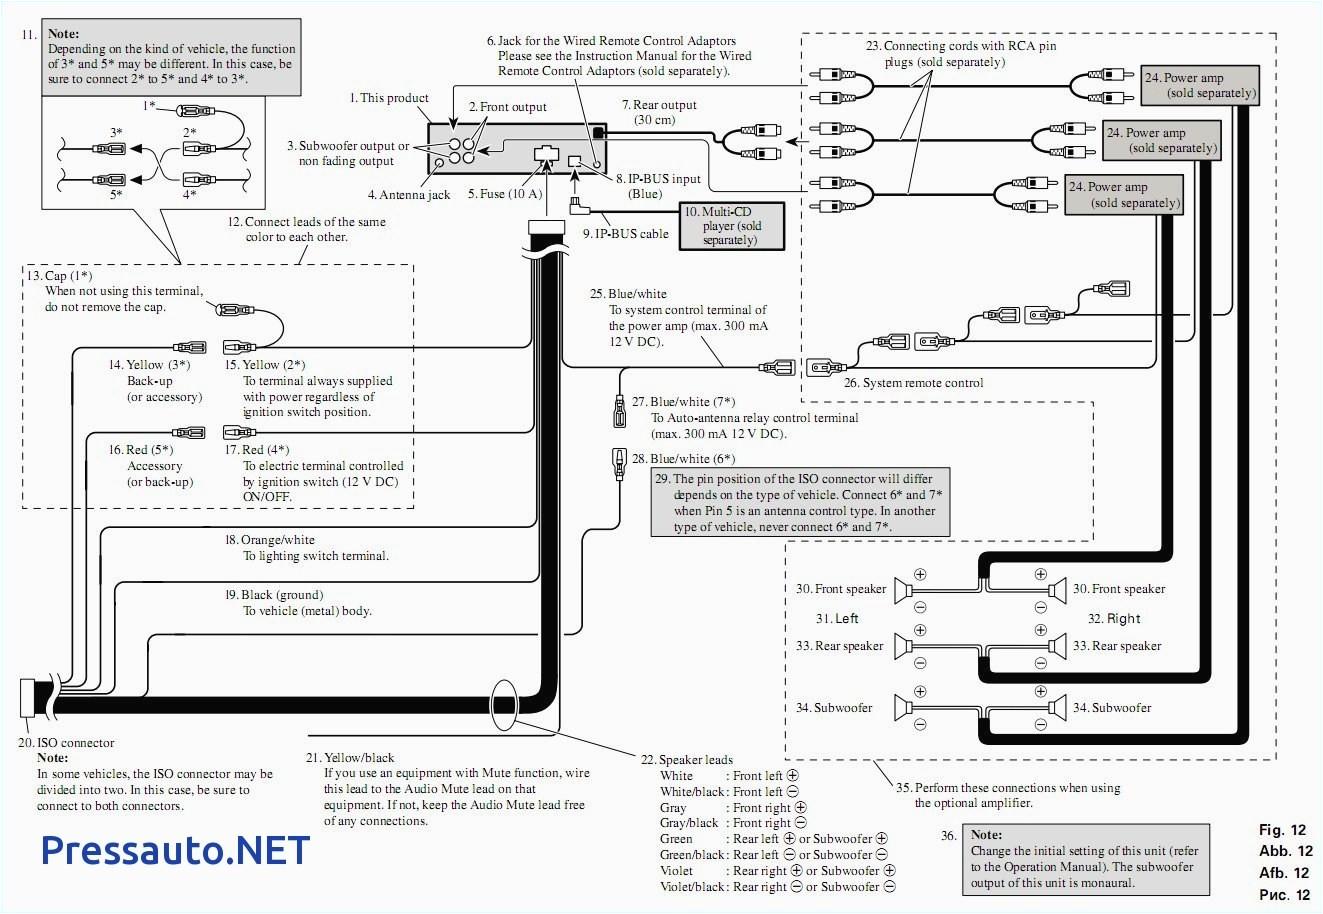 pioneer deh p4900ib wiring diagram wiring diagrams structure deh p4900ib wiring harness diagram get free image about wiring